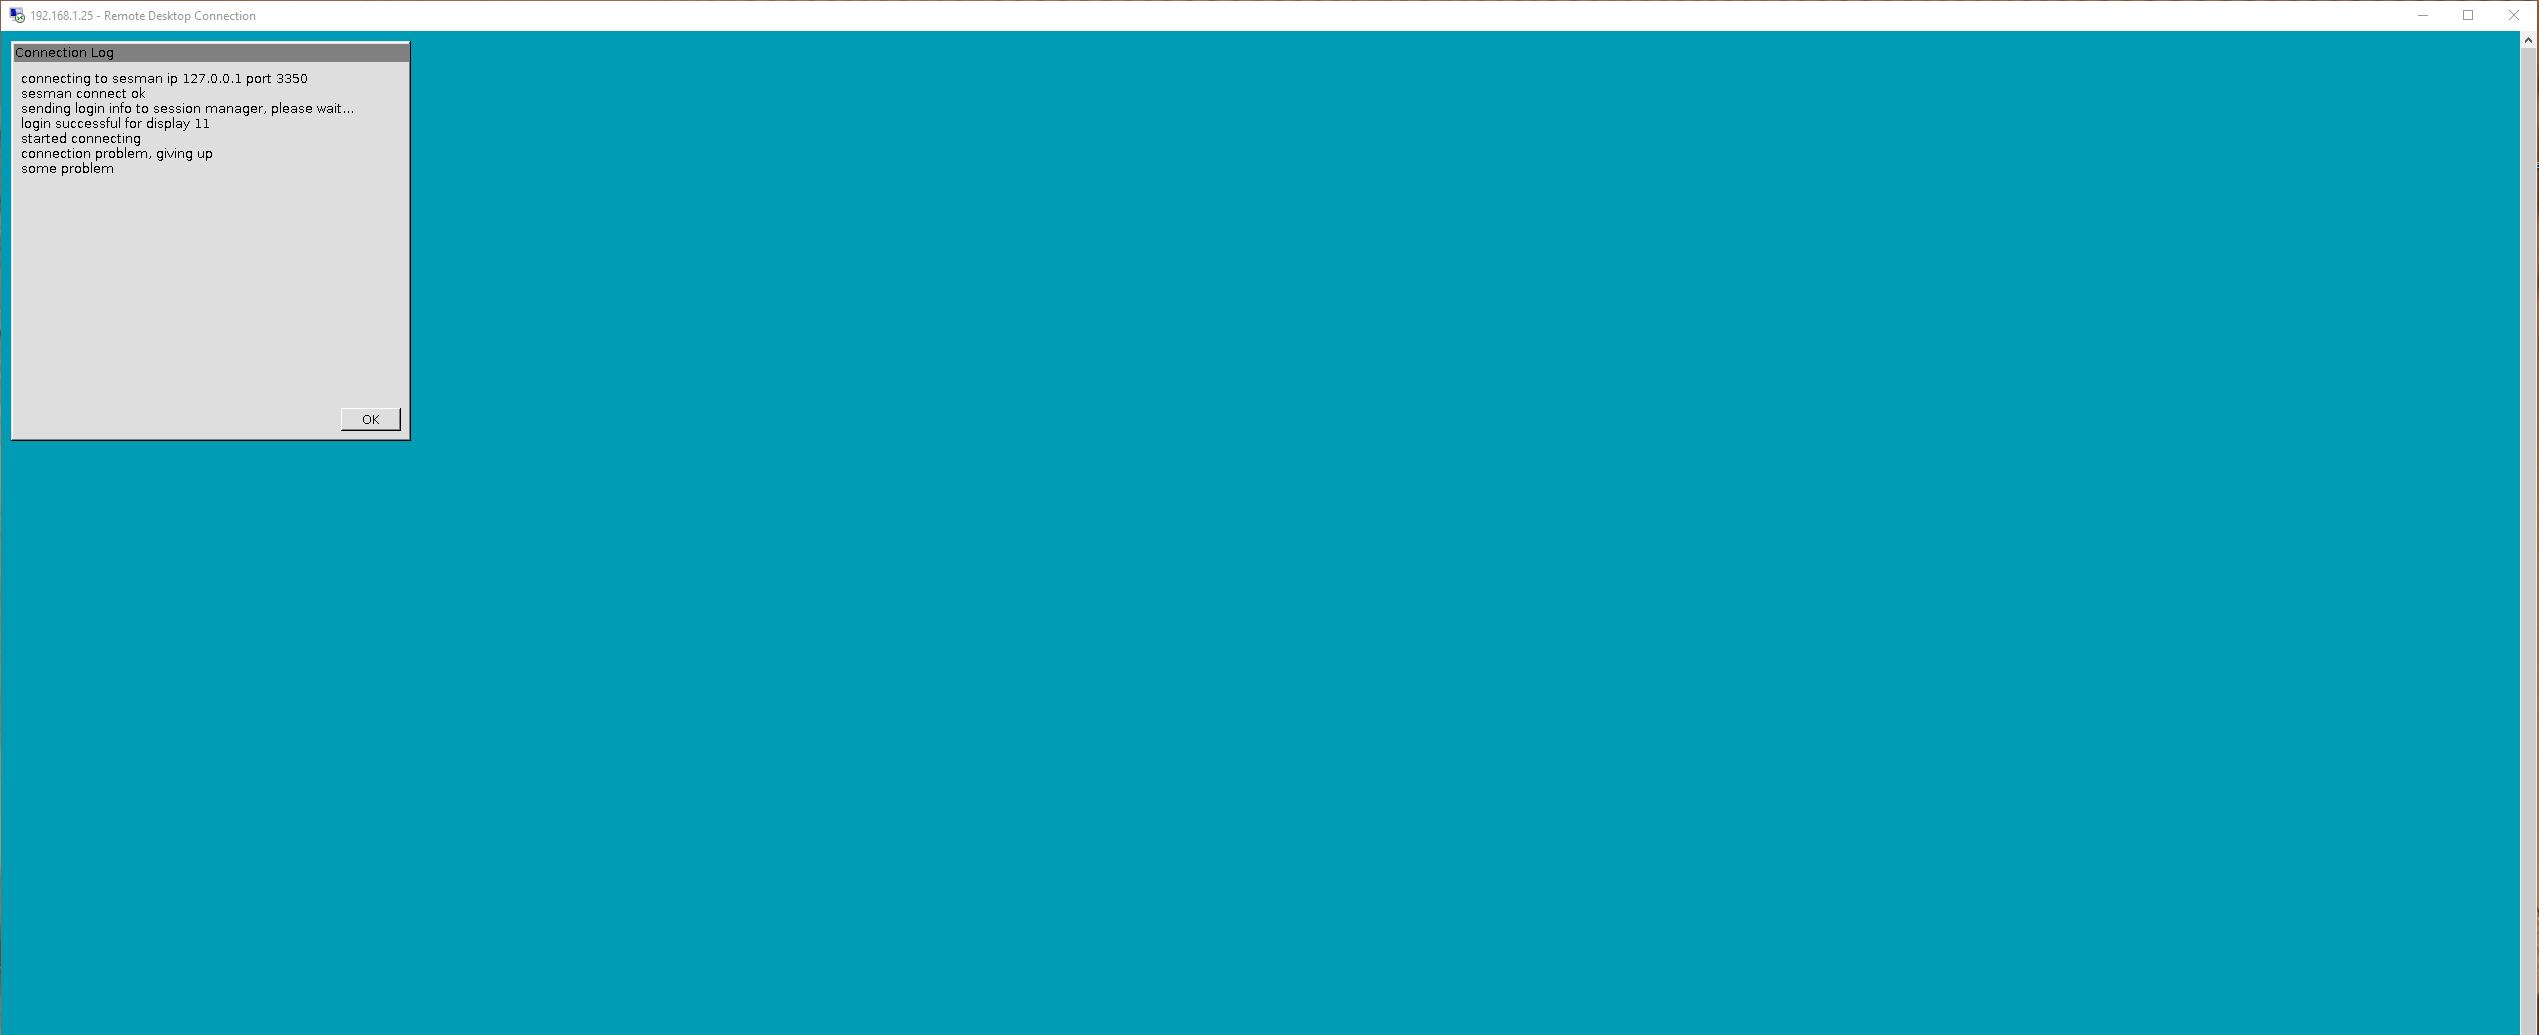 Windows 10 to Bionic Beaver 18 04 via xRDP - Linux